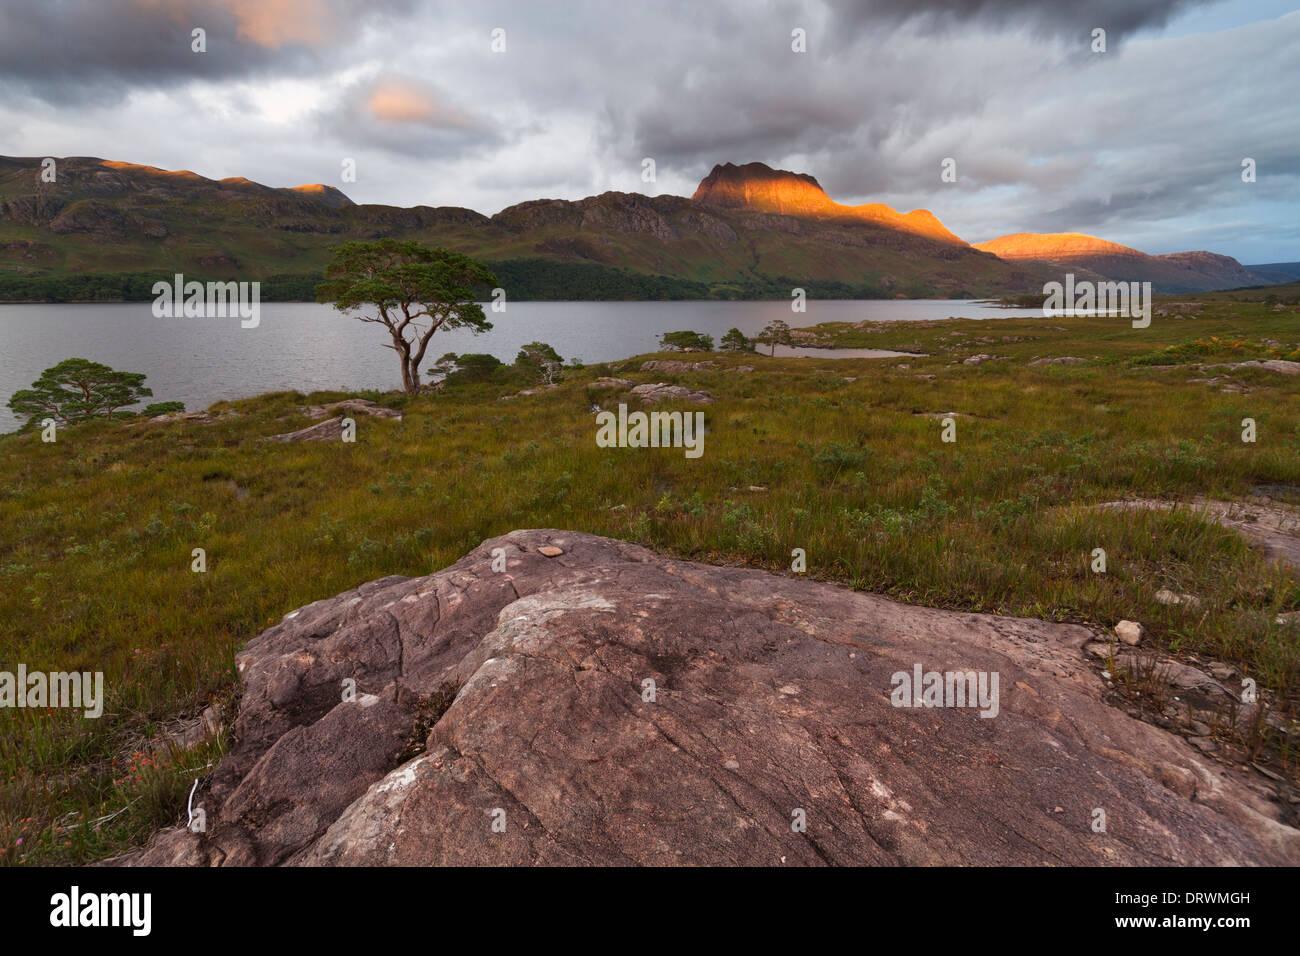 Scottish Highlands, Loch Maree and Slioch Stock Photo